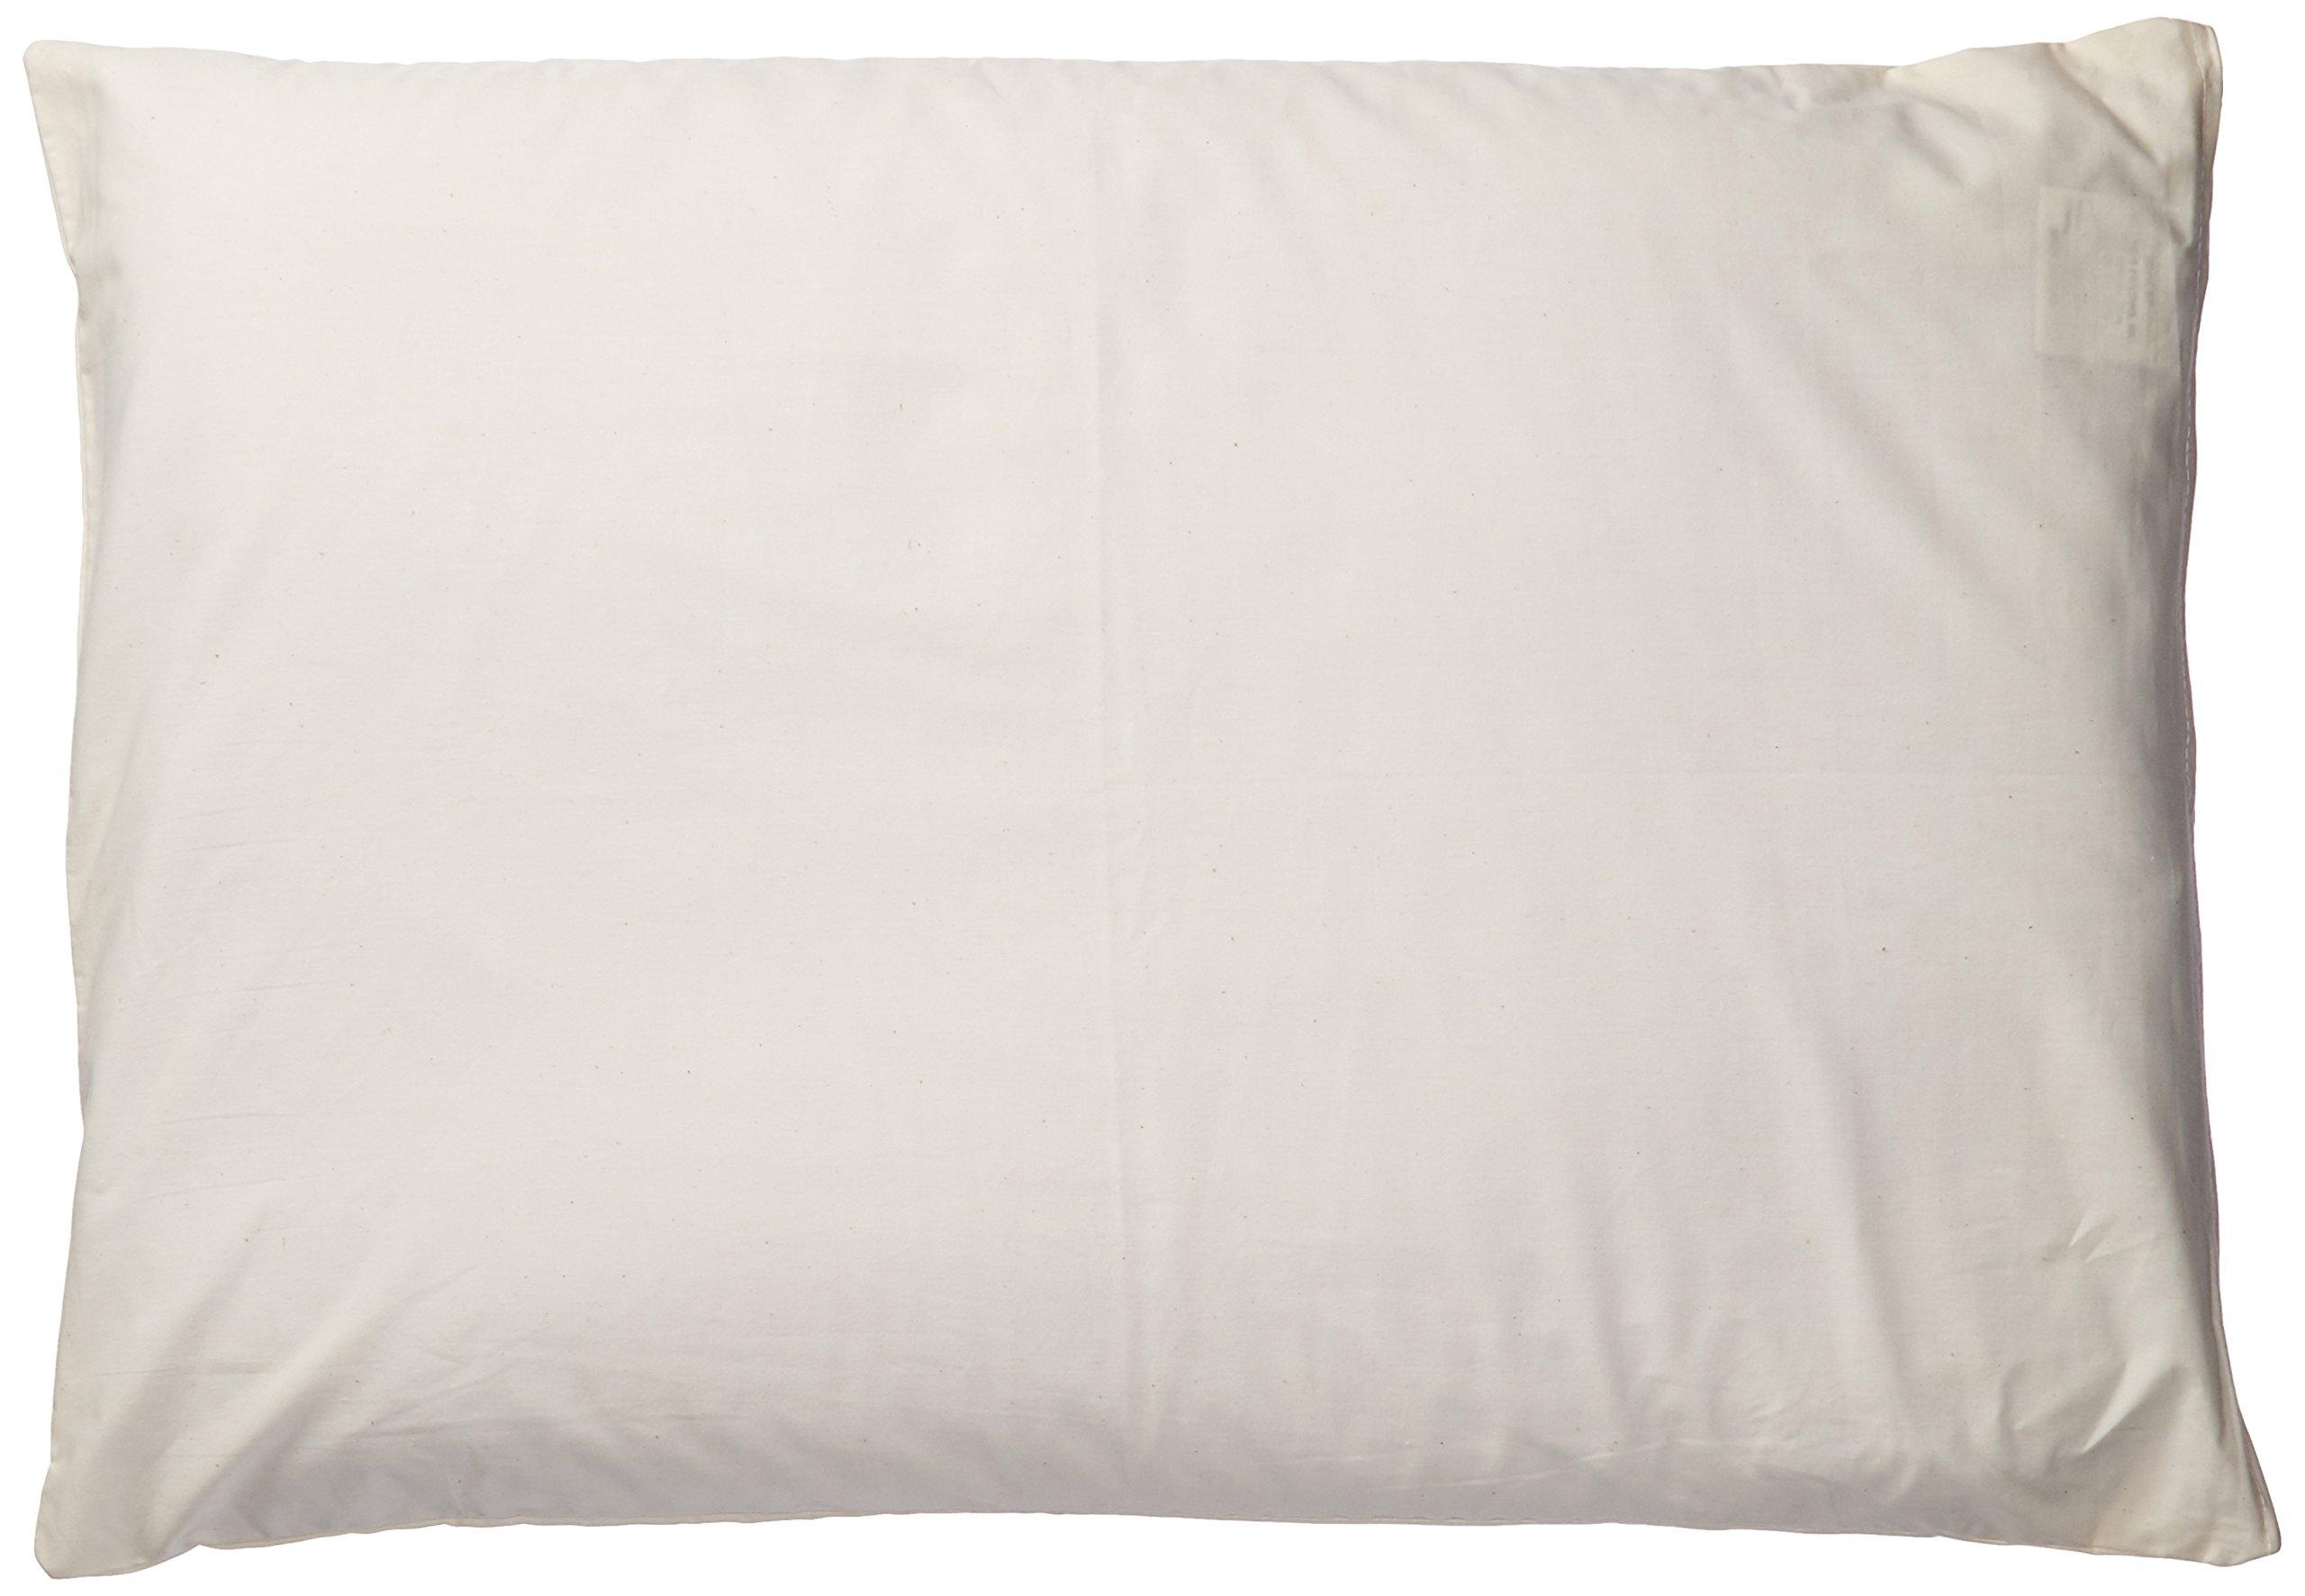 Natures Pillows Sobakawa Buckwheat Pillow With Free Pillow Protective Cover, 19'' x 29''